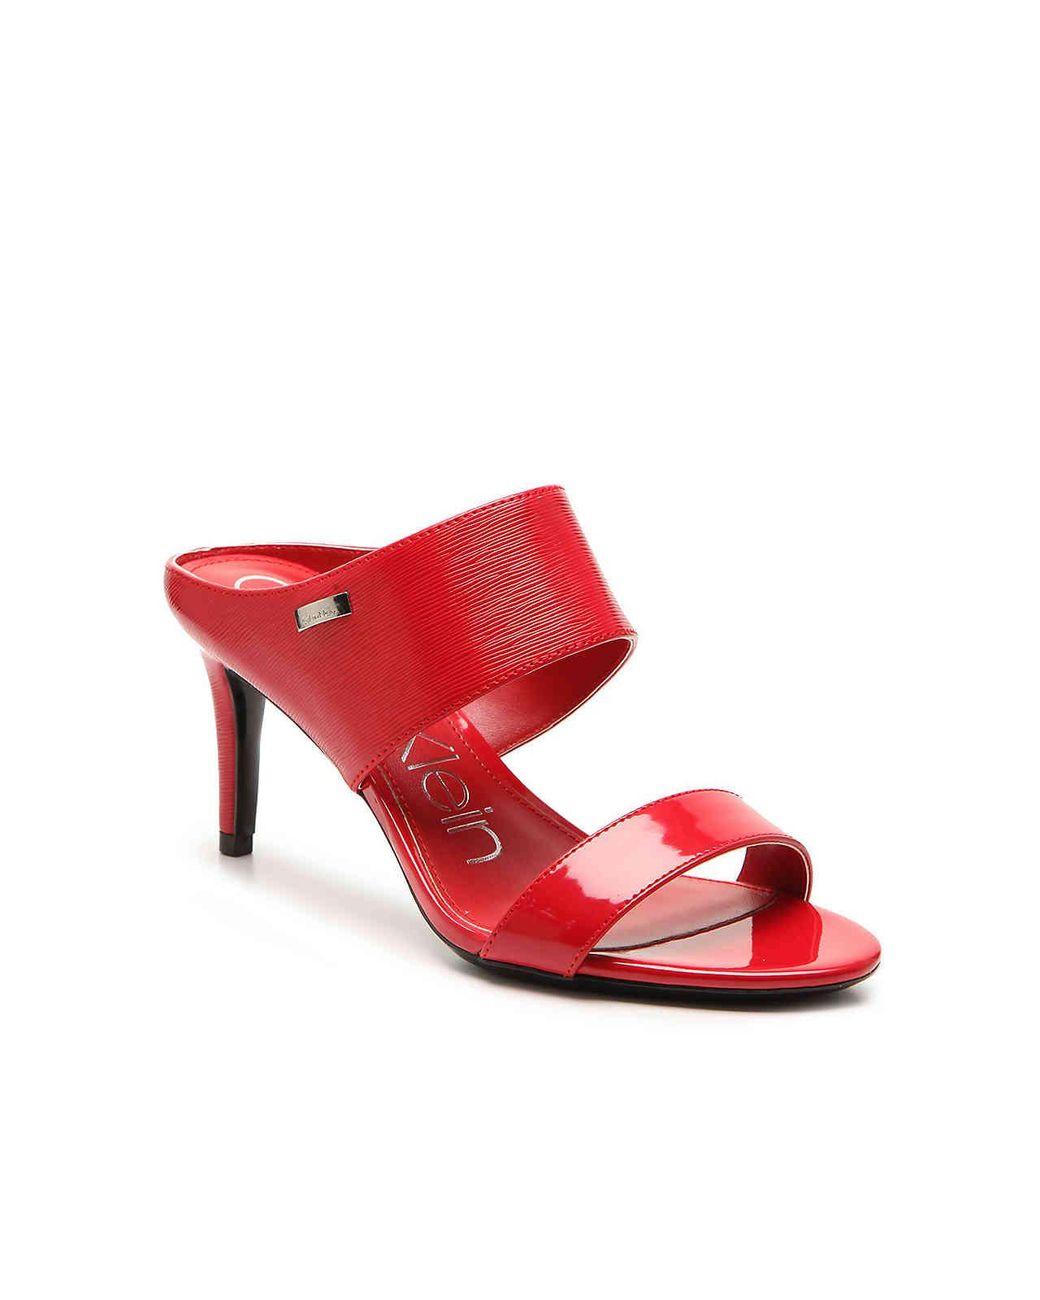 27c4cd9e905 Lyst - Calvin Klein Lorinda Sandal in Red